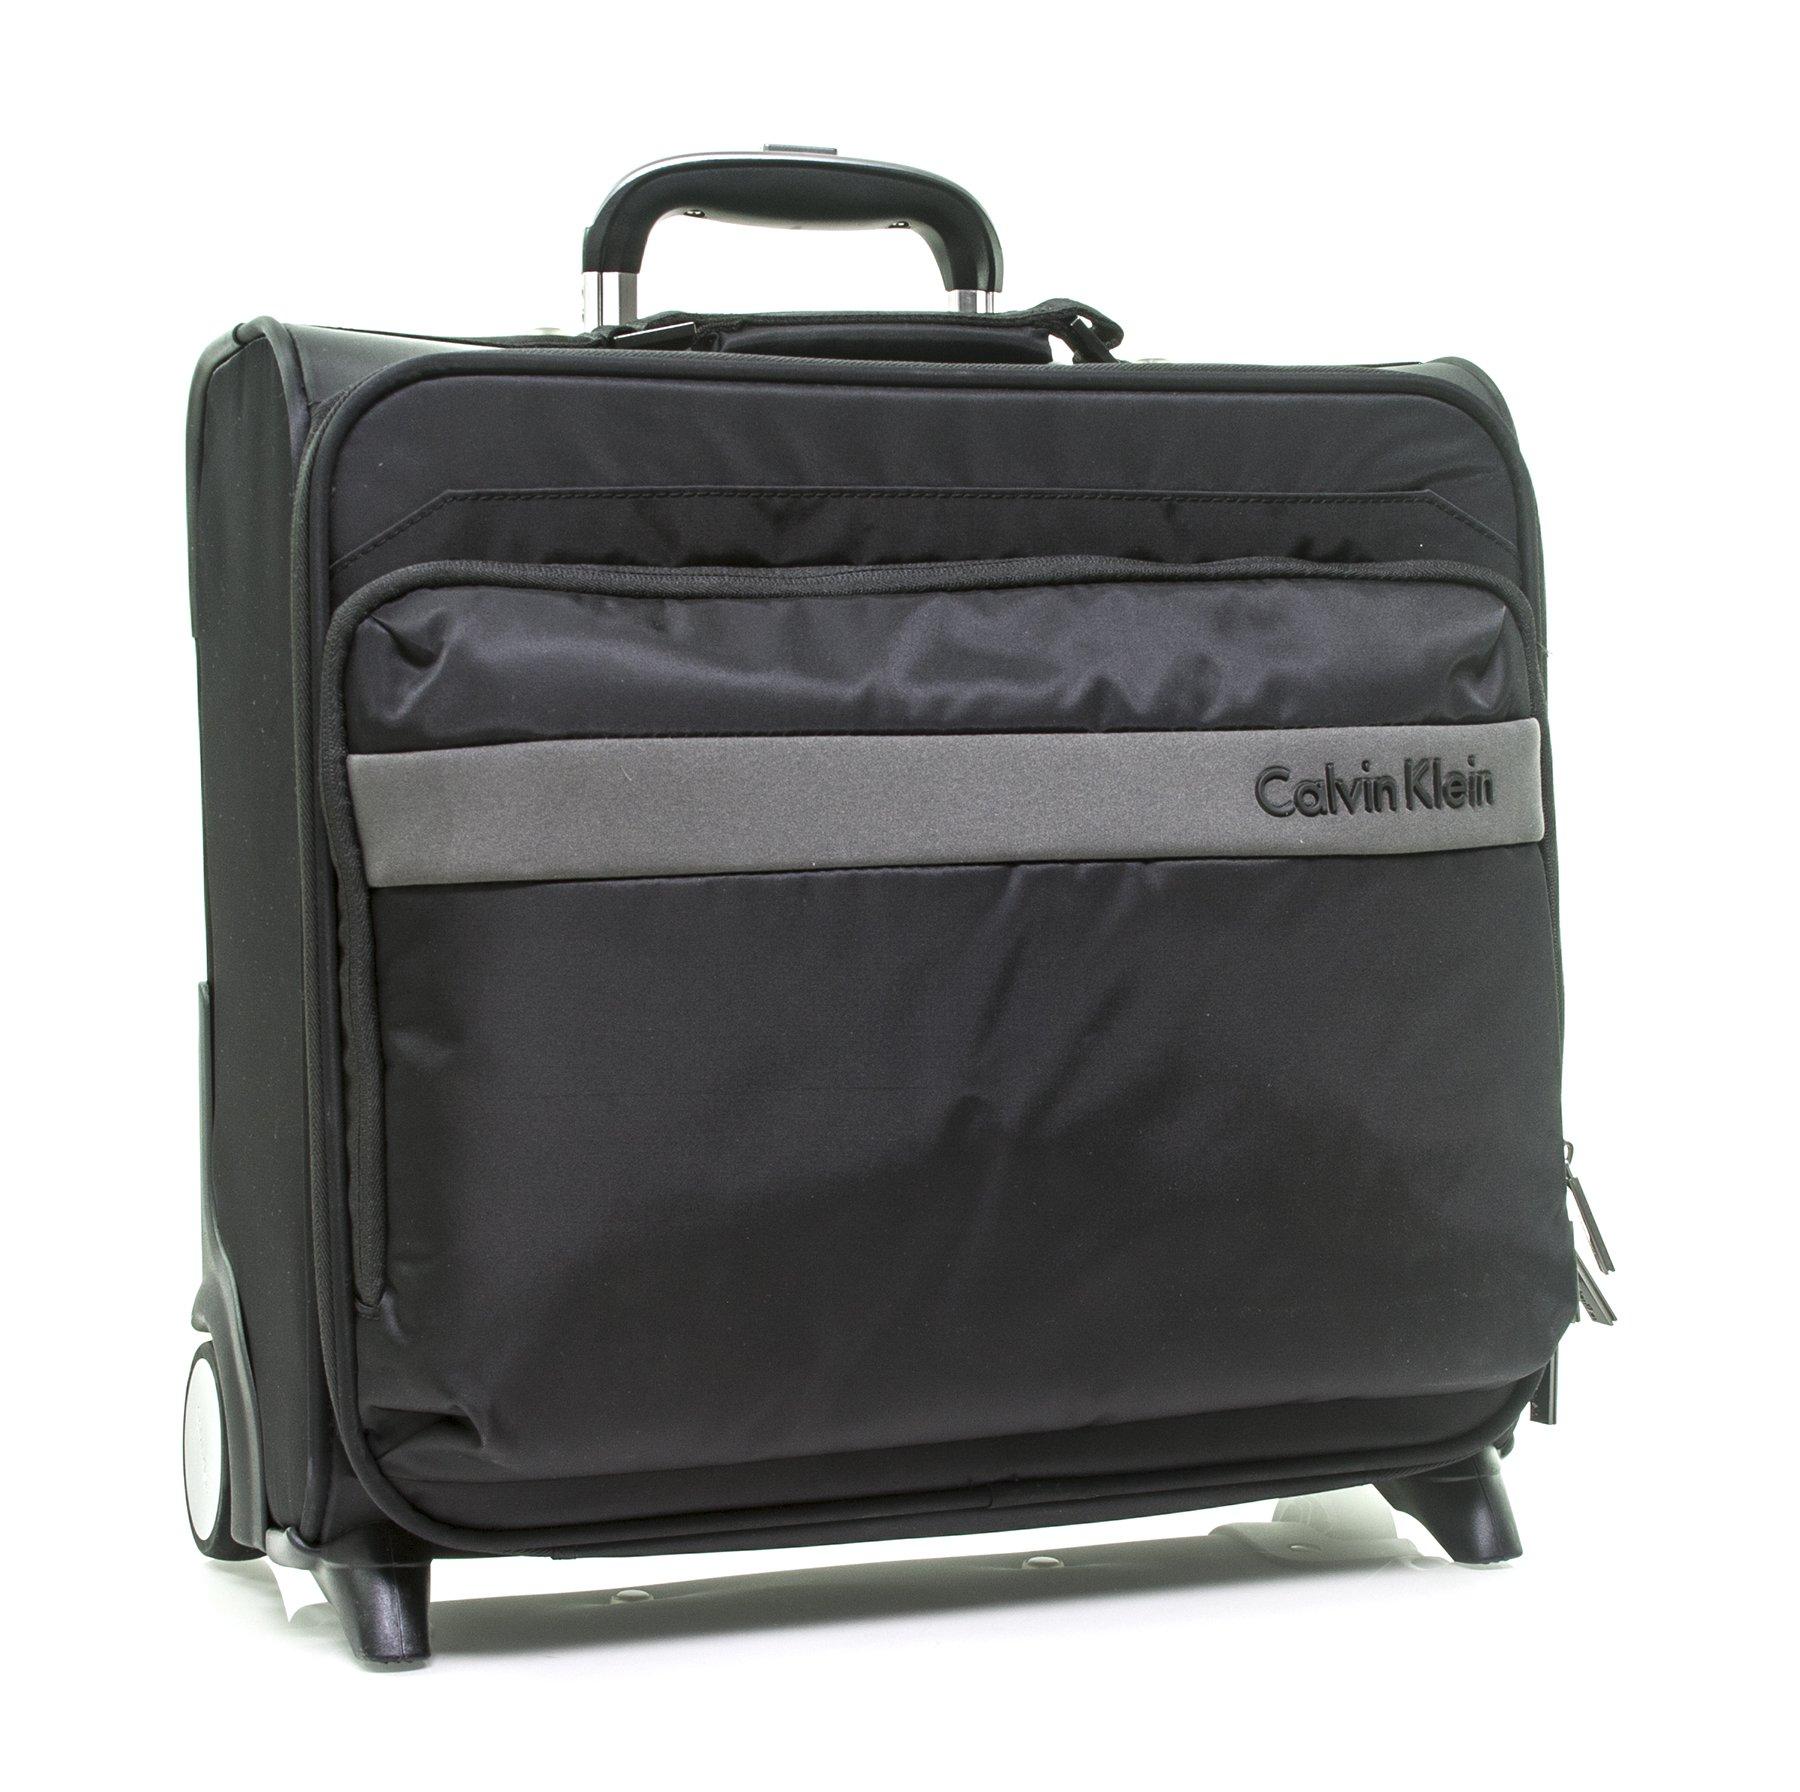 Calvin Klein Flatiron 3.0 Wheeled Pilot Case Rolling Duffel, Black, One Size